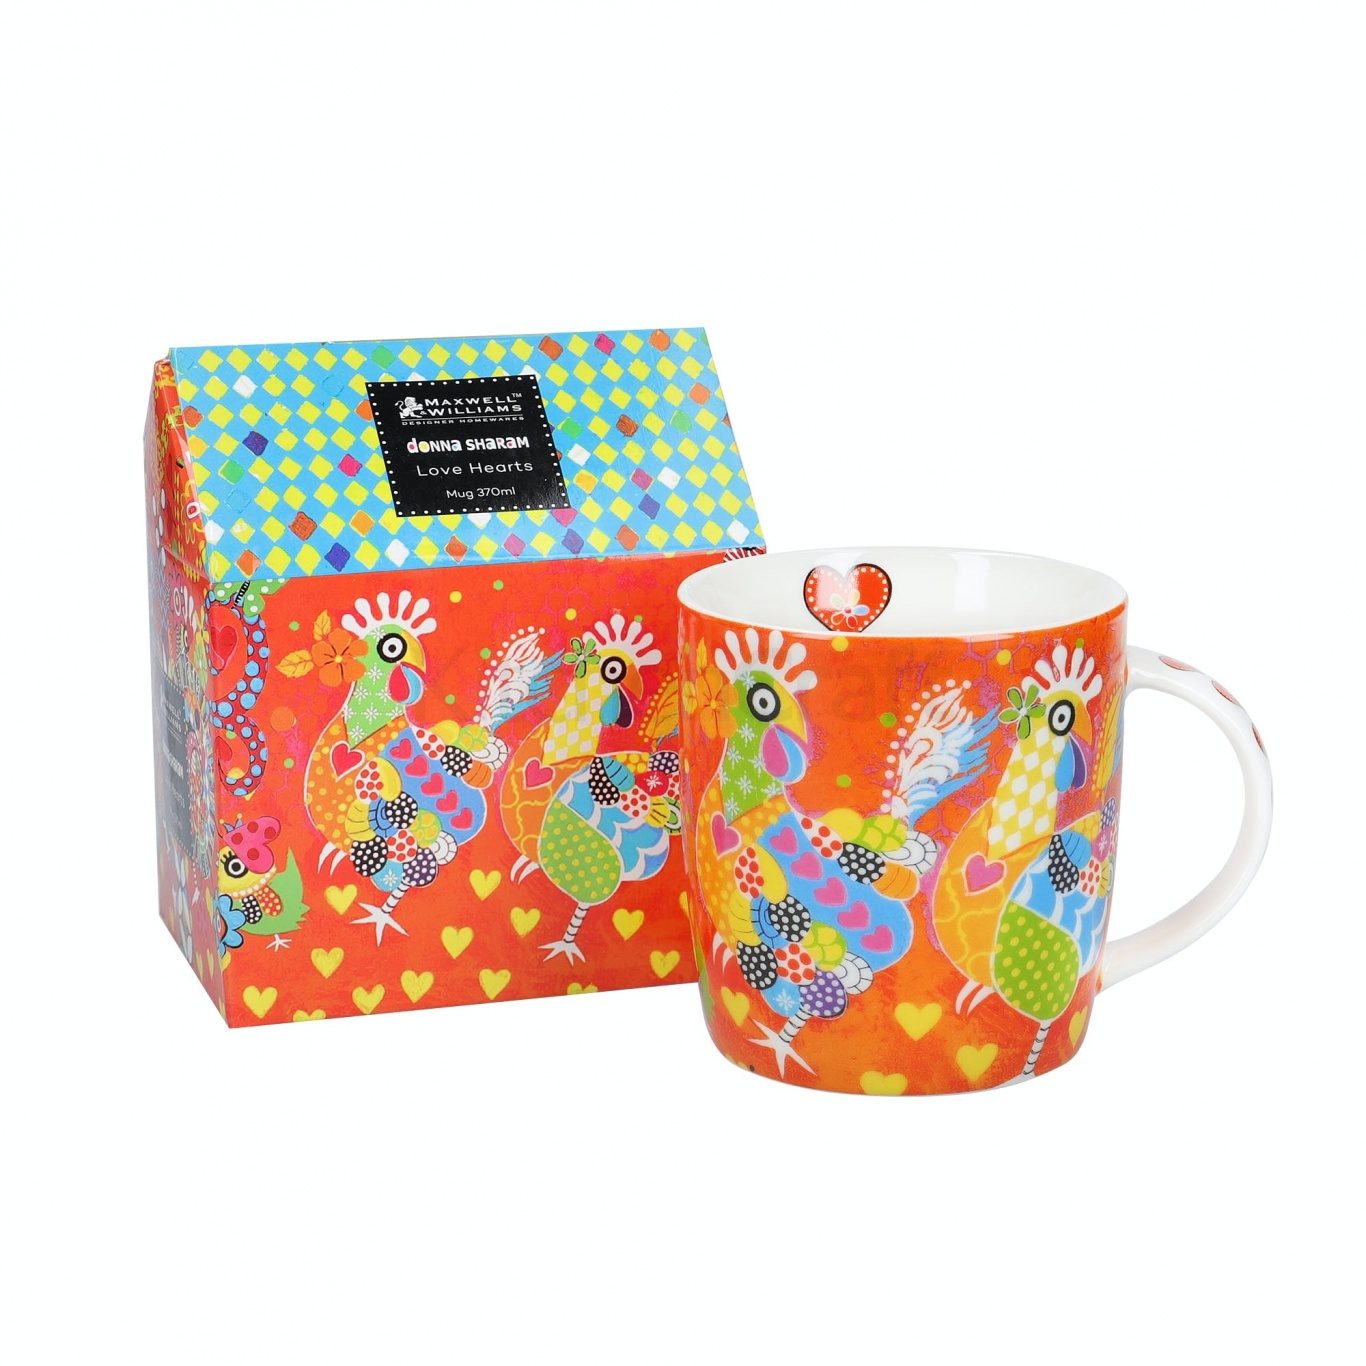 Image of Maxwell & Williams Chicken Dance Mug & Coaster Set